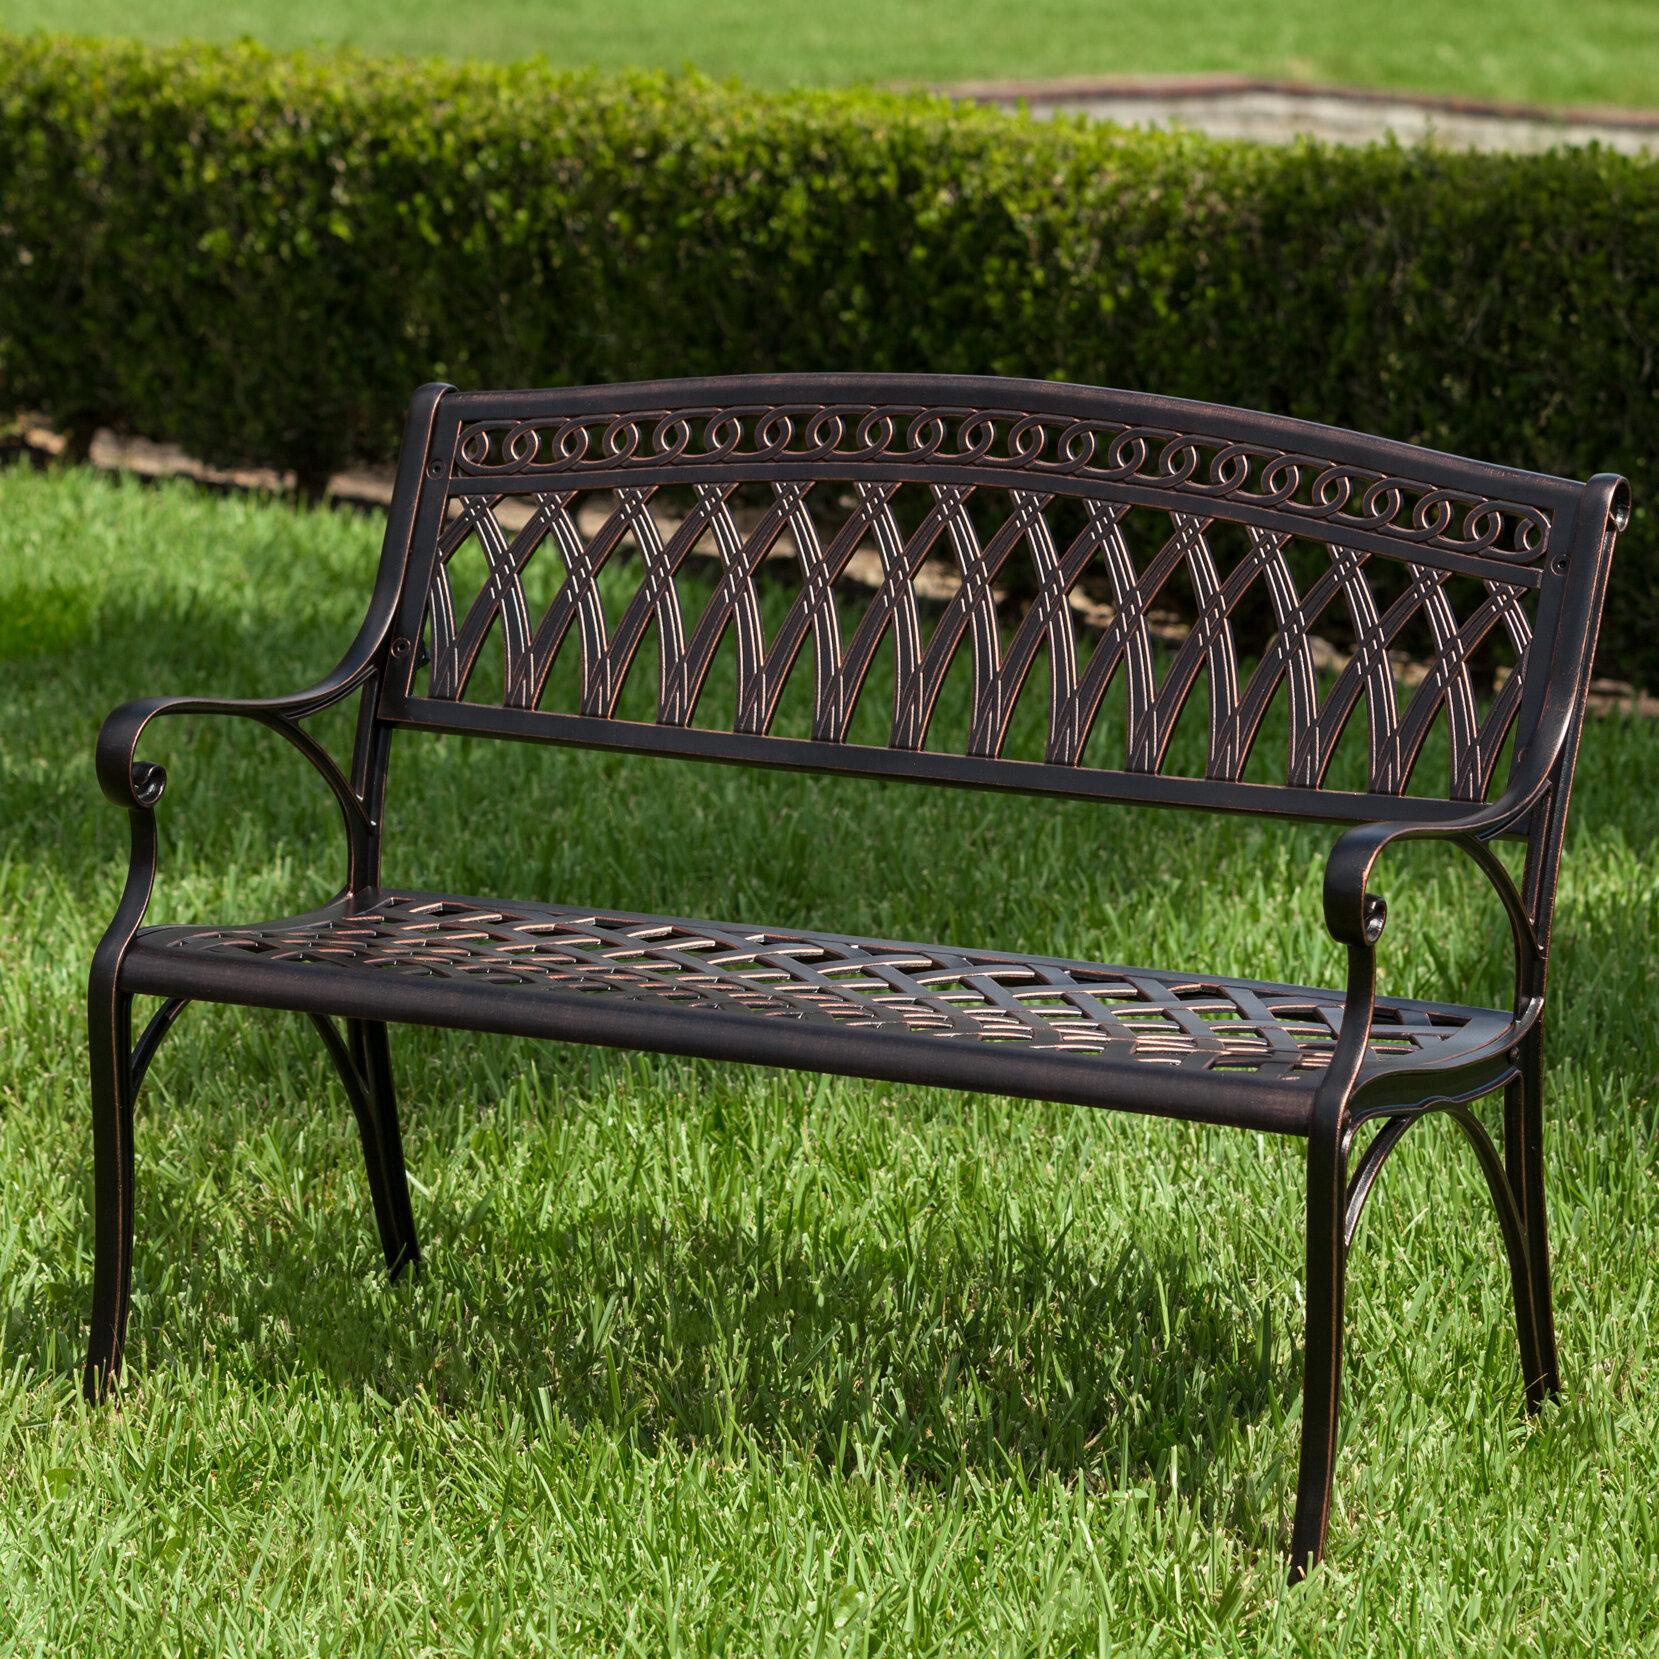 Simone Cast Aluminum Garden Bench Inside Alvah Slatted Cast Iron And Tubular Steel Garden Benches (View 11 of 25)